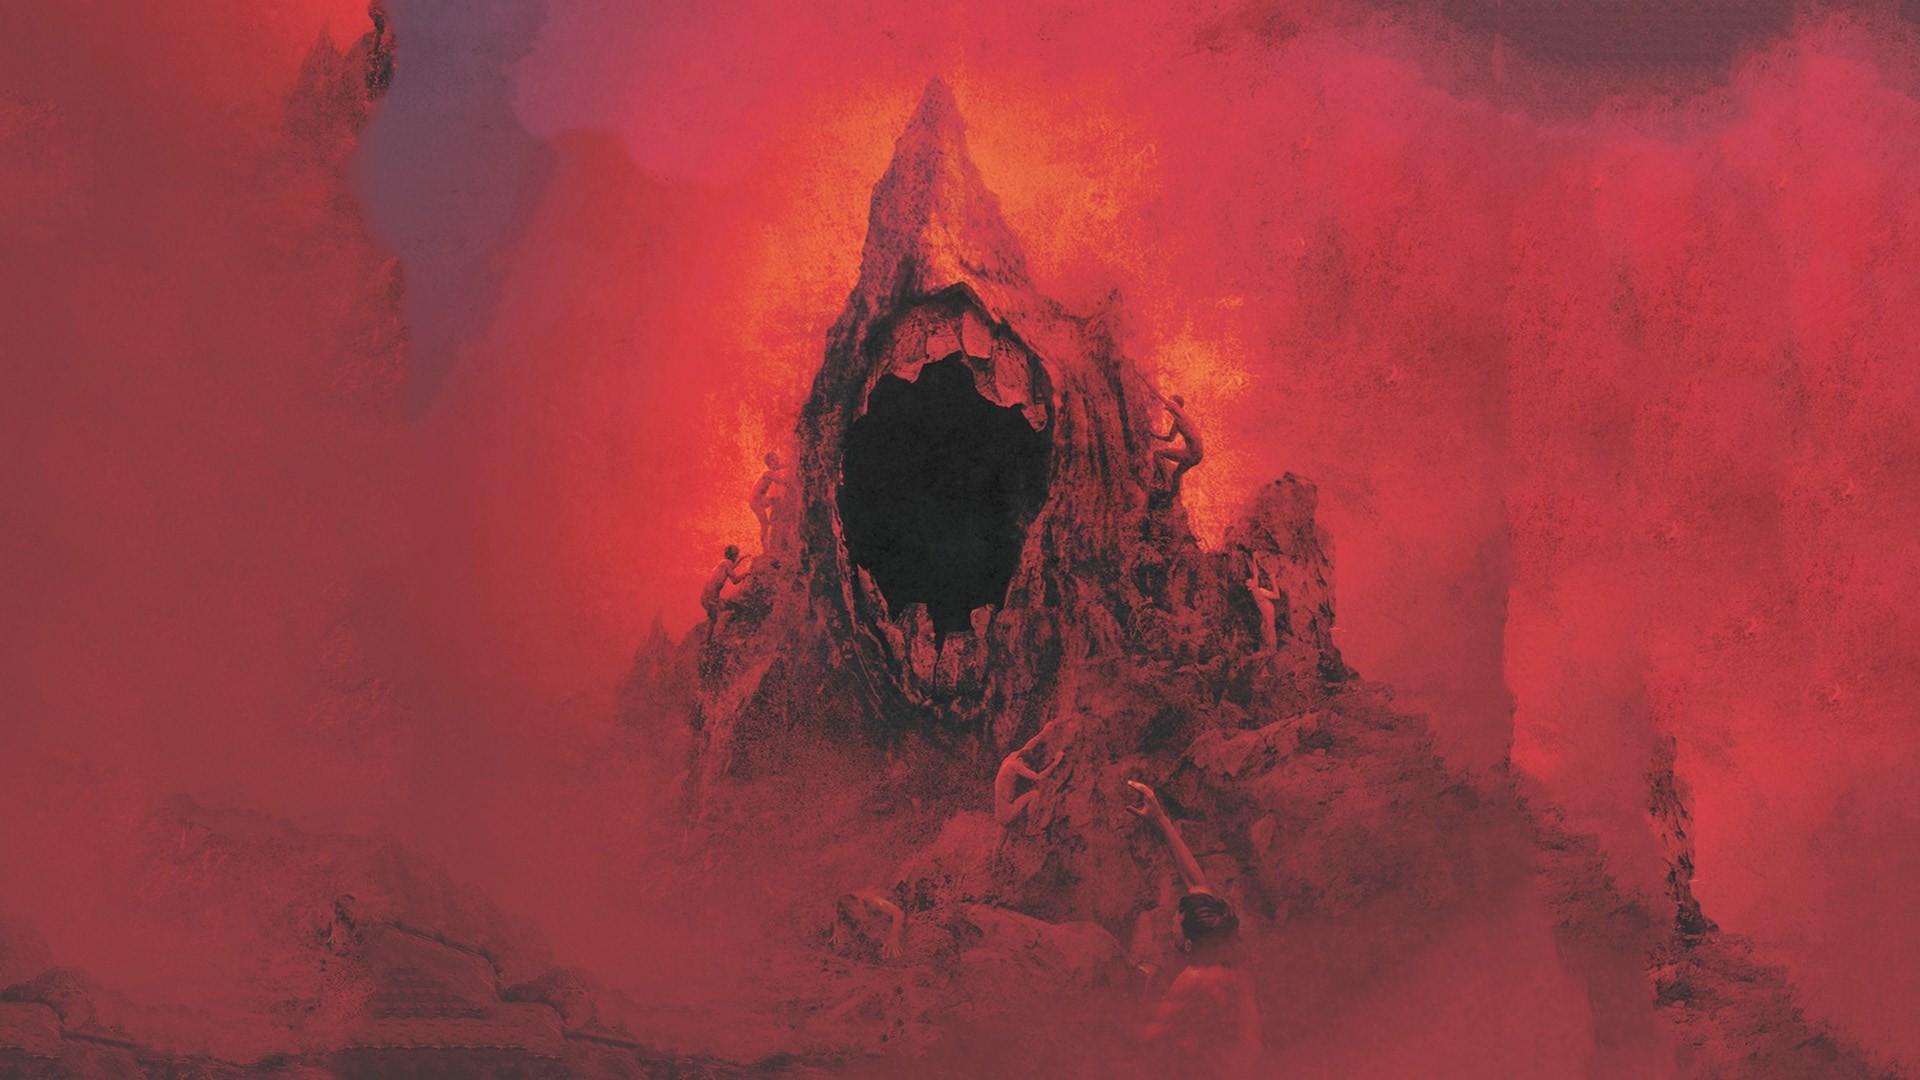 Darkthrone Wallpaper 56 Images